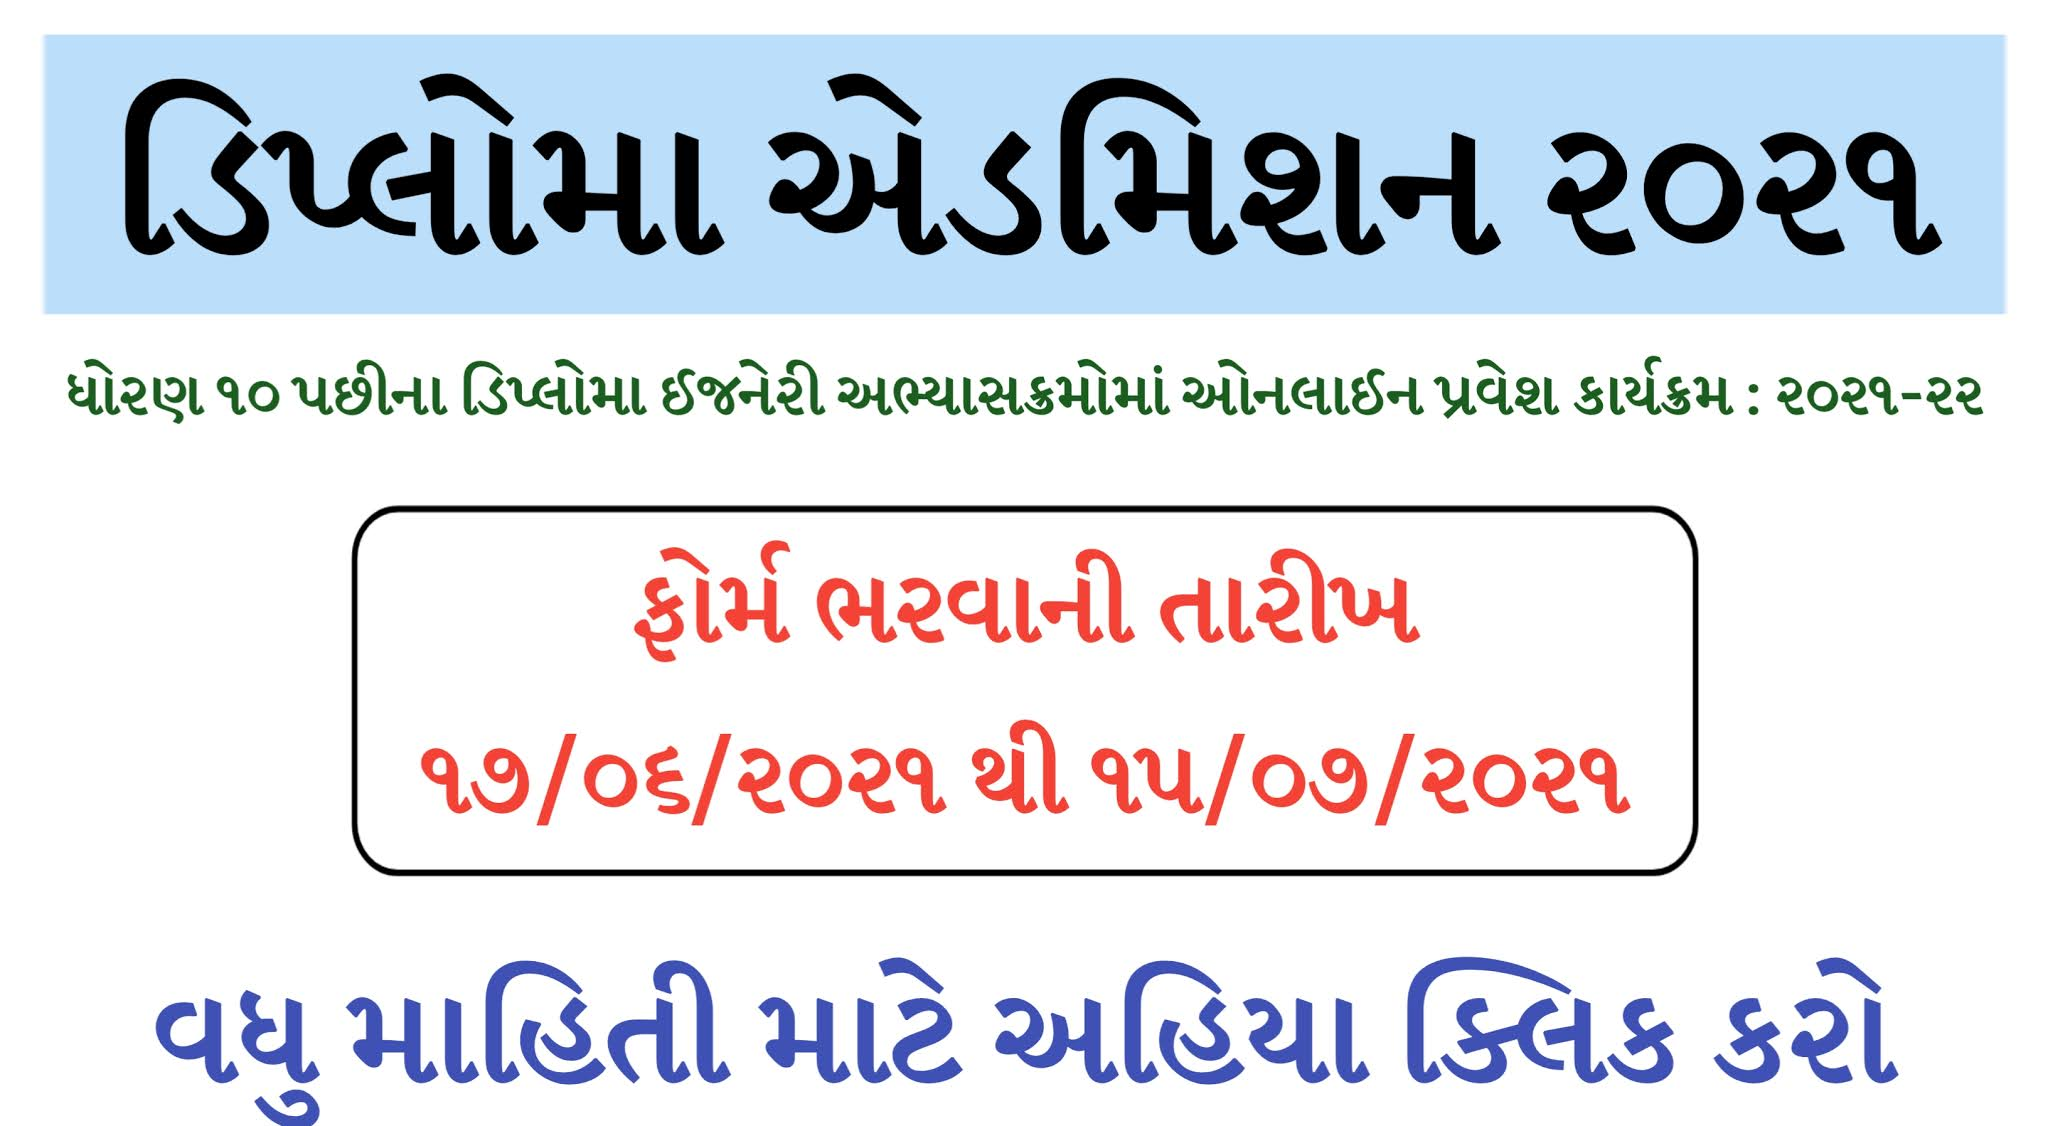 Diploma Admission 2021 | Gujarat Diploma Admission 2021 | @gujdiploma.nic.in | @acpdc.co.in | Diploma Admission 2021-22 | Gujarat Diploma Admission 2021-22 | Diploma Courses | Gujarat Diploma College List | Gujarat Diploma College List 2021 | Gujarat Diploma College List 2021-22 | Gujarat Diploma Admission Form Online 2021 | Gujarat Diploma Admission 2021 booklet | Gujarat Diploma Admission 2021 Merit List | Gujarat Diploma Courses List |